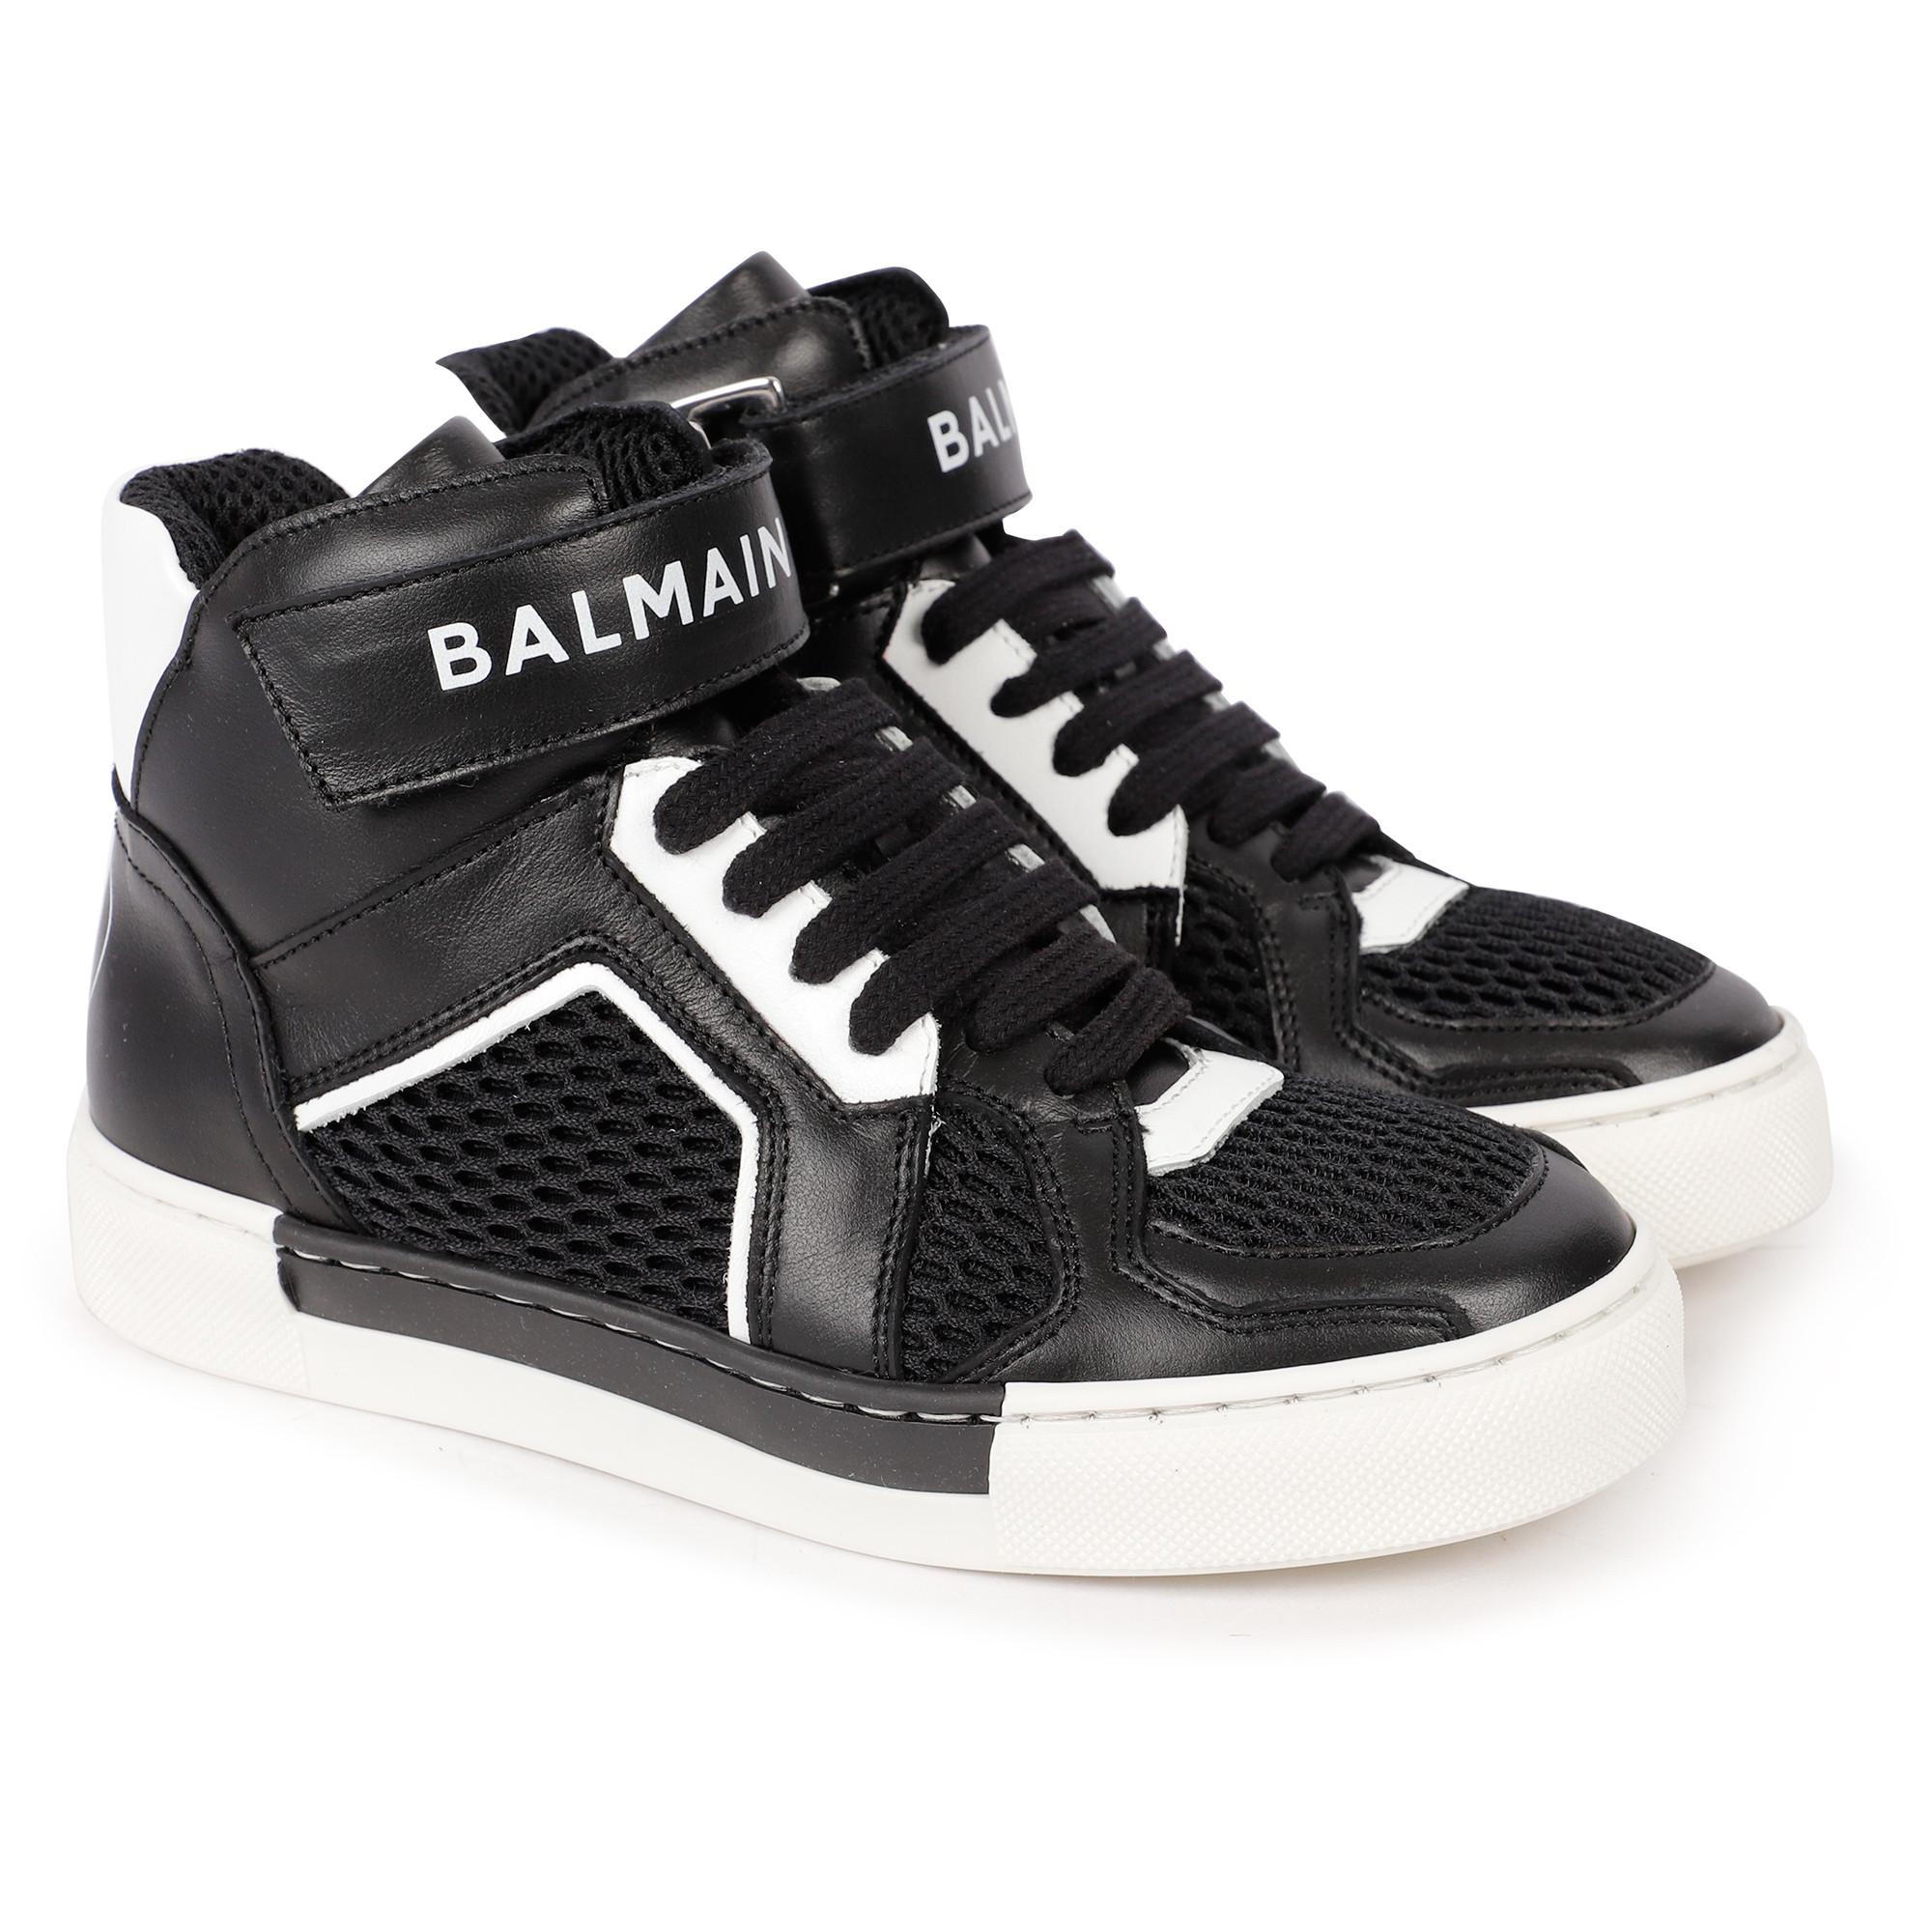 Balmain Logo Ankle Sneakers in Black